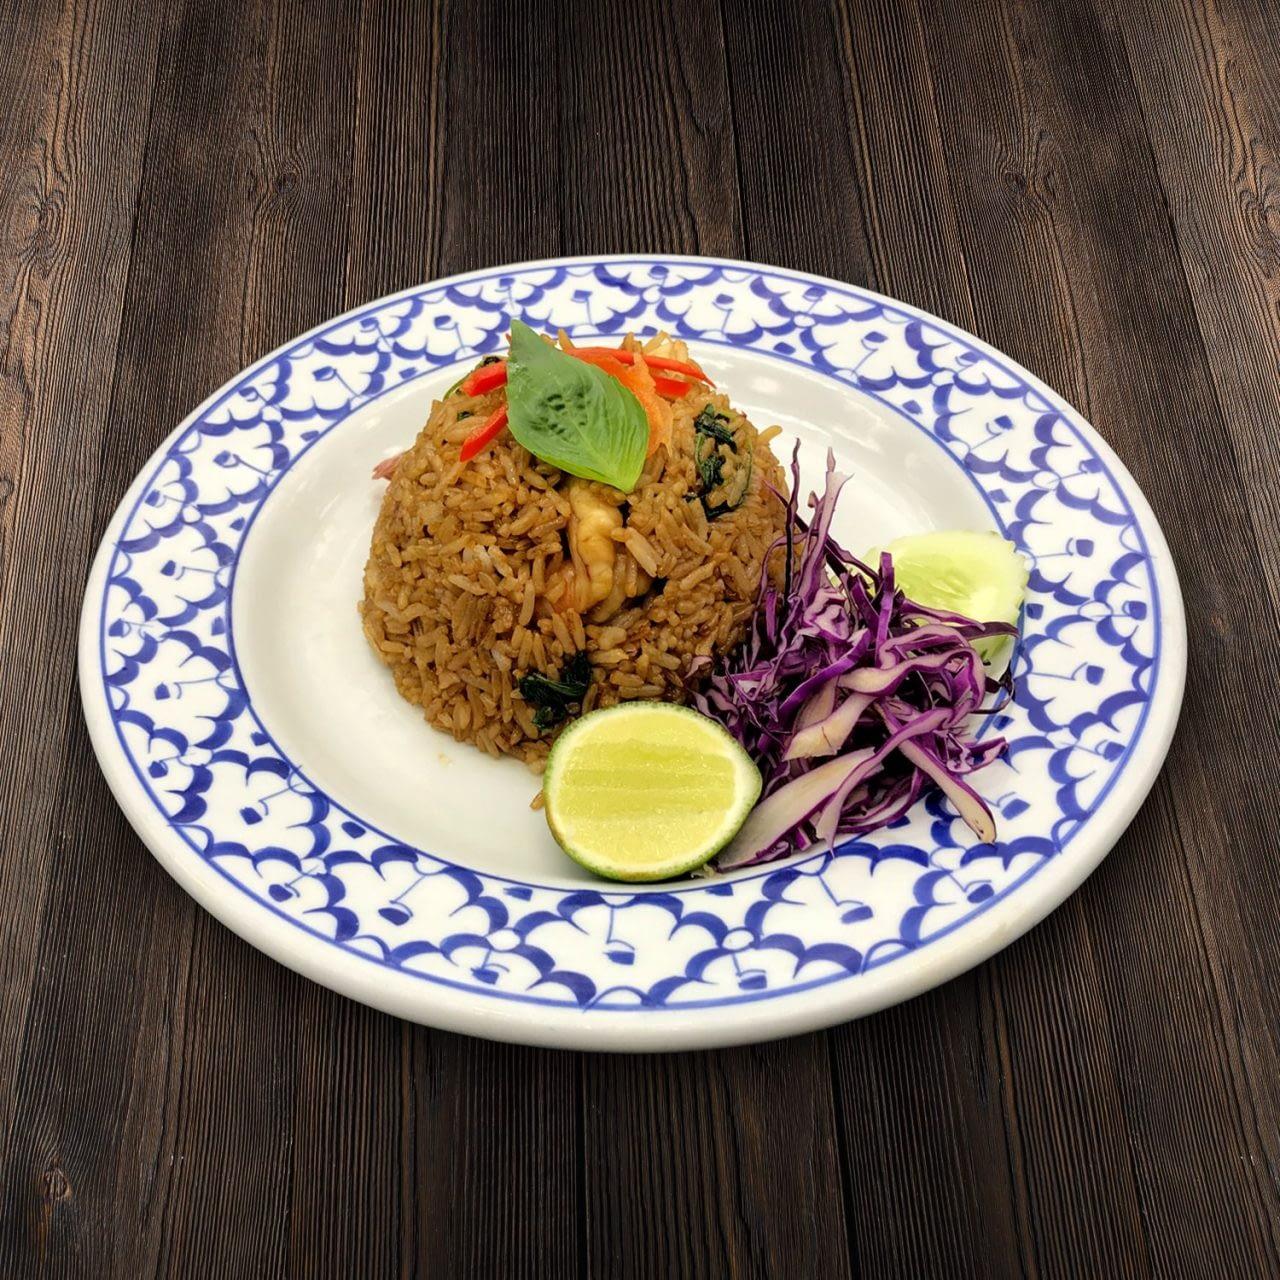 Thai Food Delivery Kuala Lumpur Basil Leaf Fried Rice with Shrimp